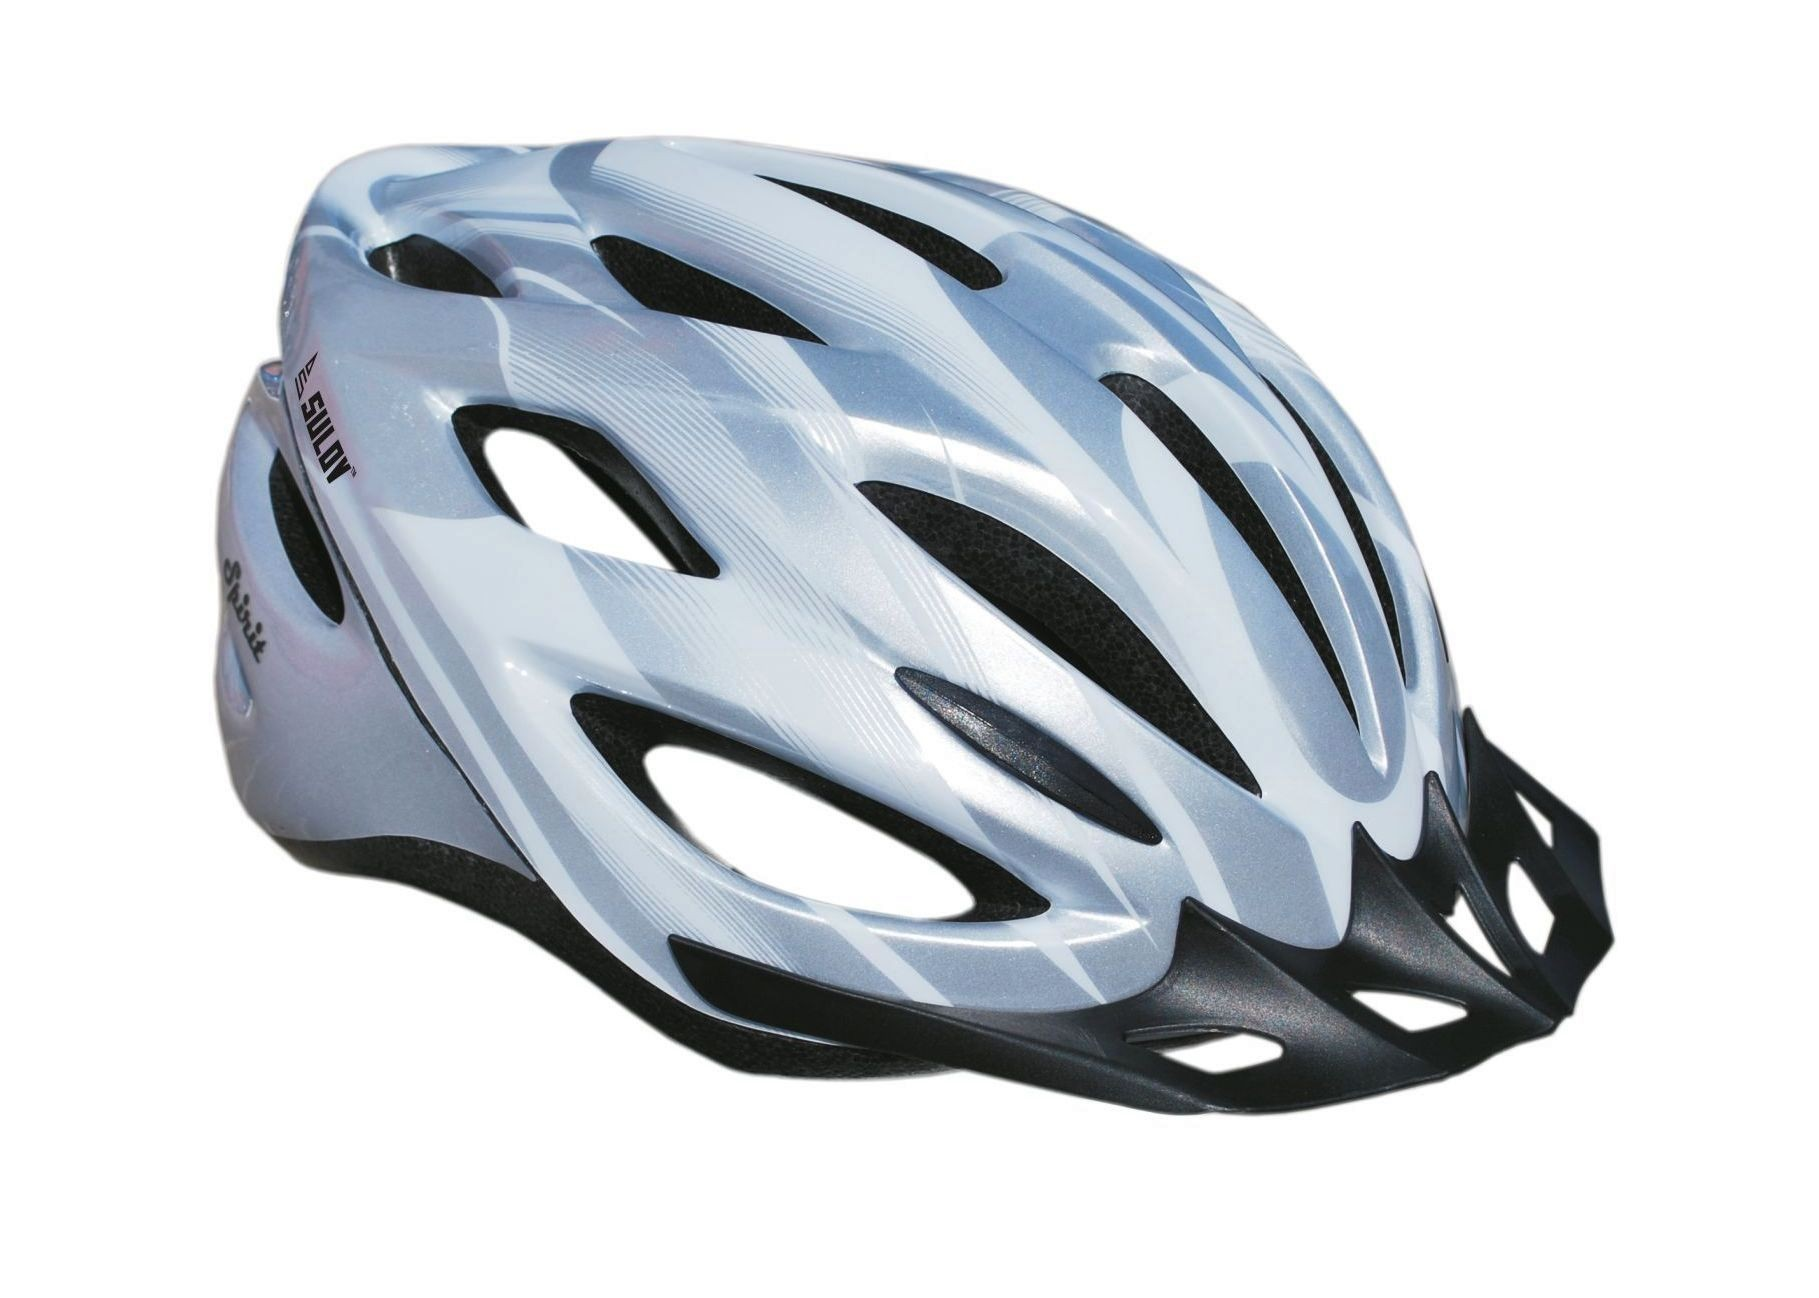 Cyklo helma SULOV SPIRIT, vel. M, stříbrná